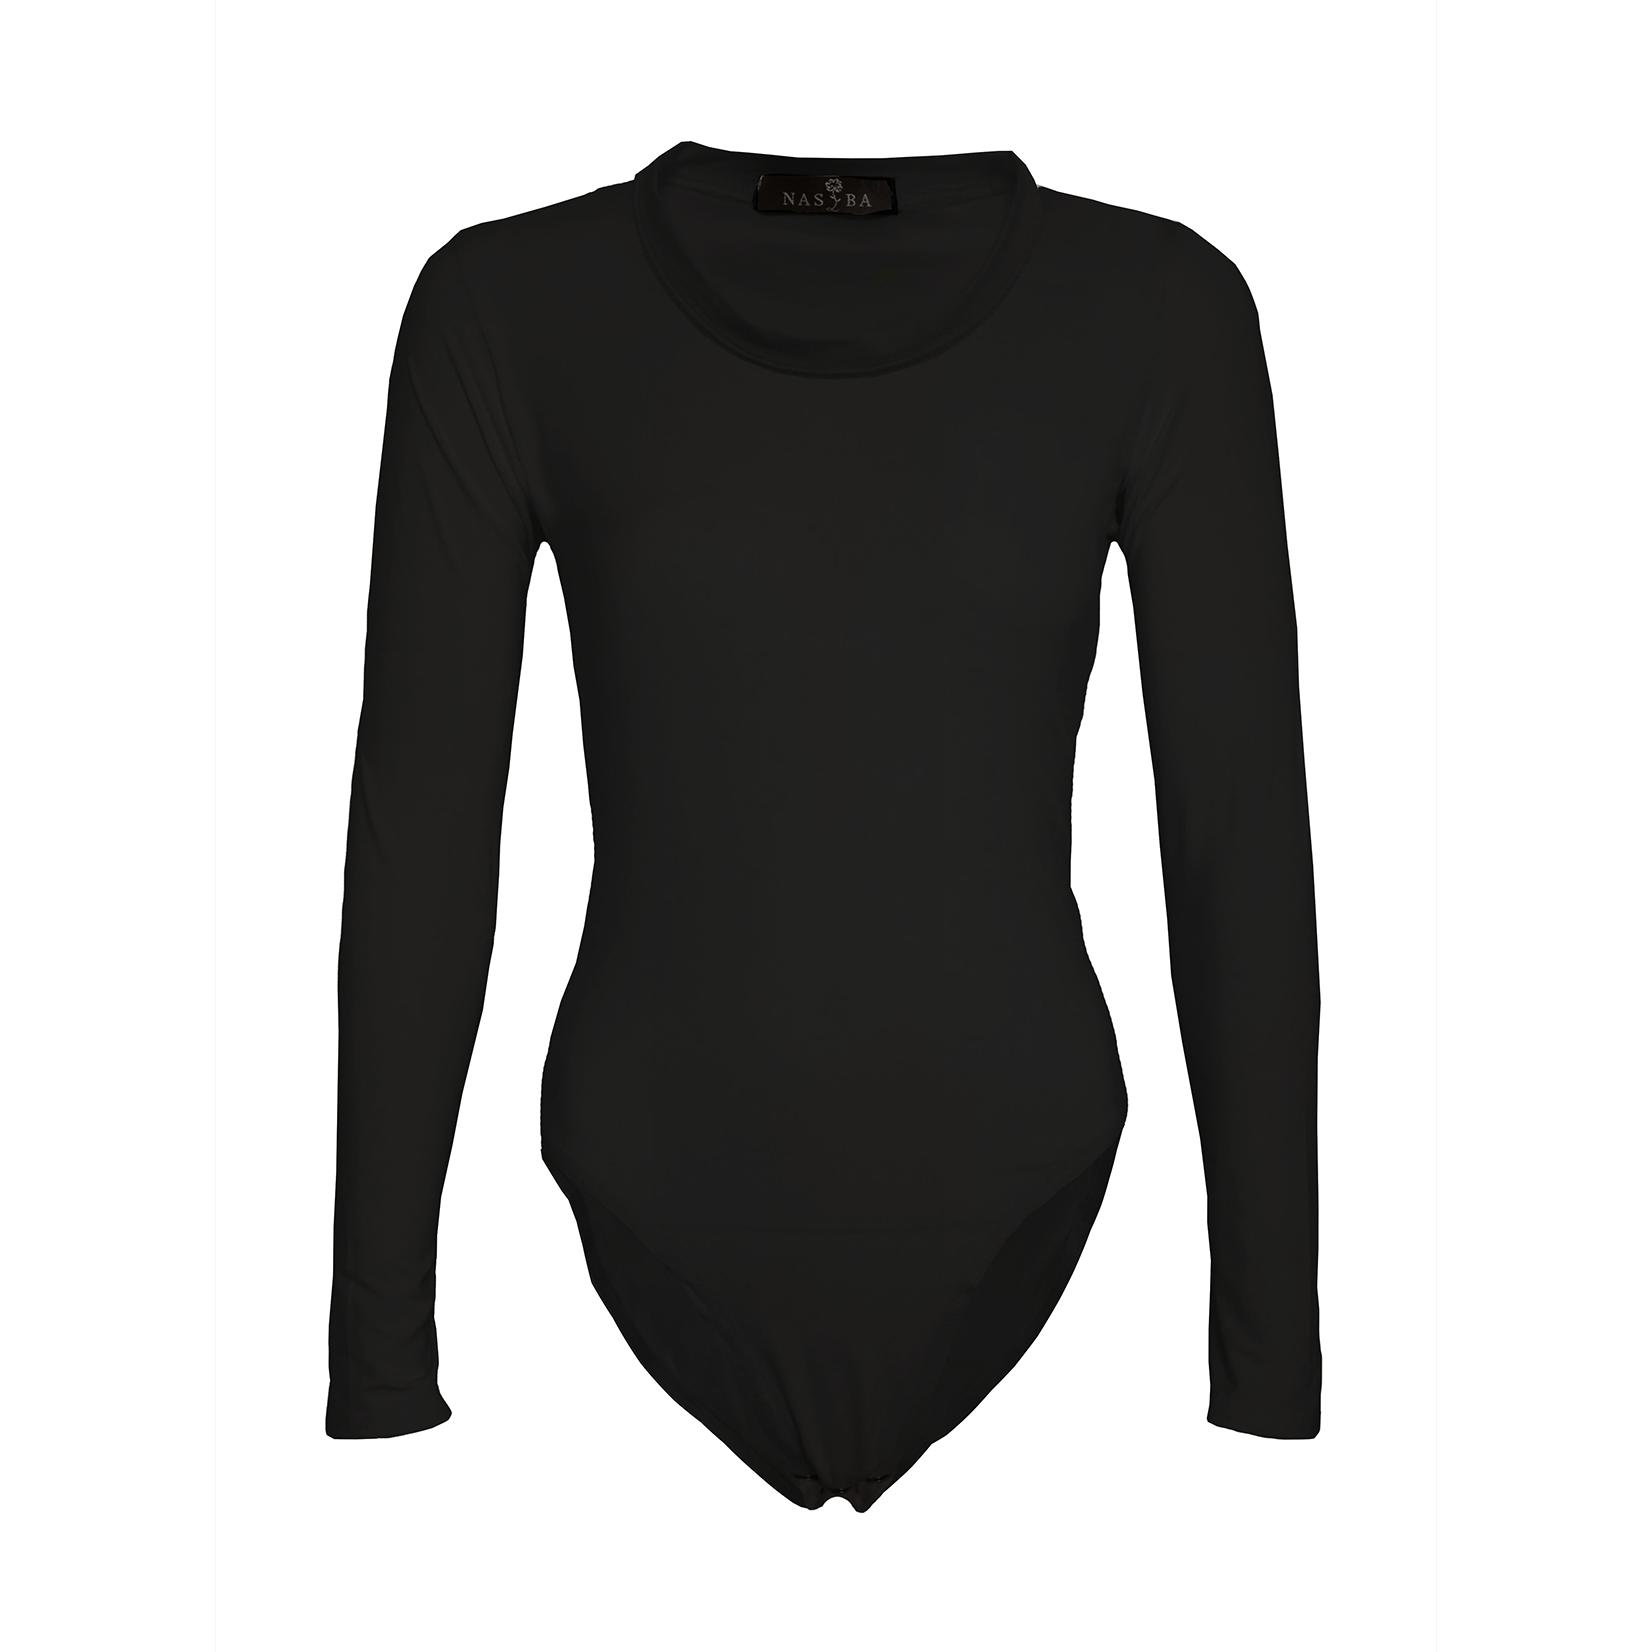 Nasiba Fashion Black Jersey Bodysuit